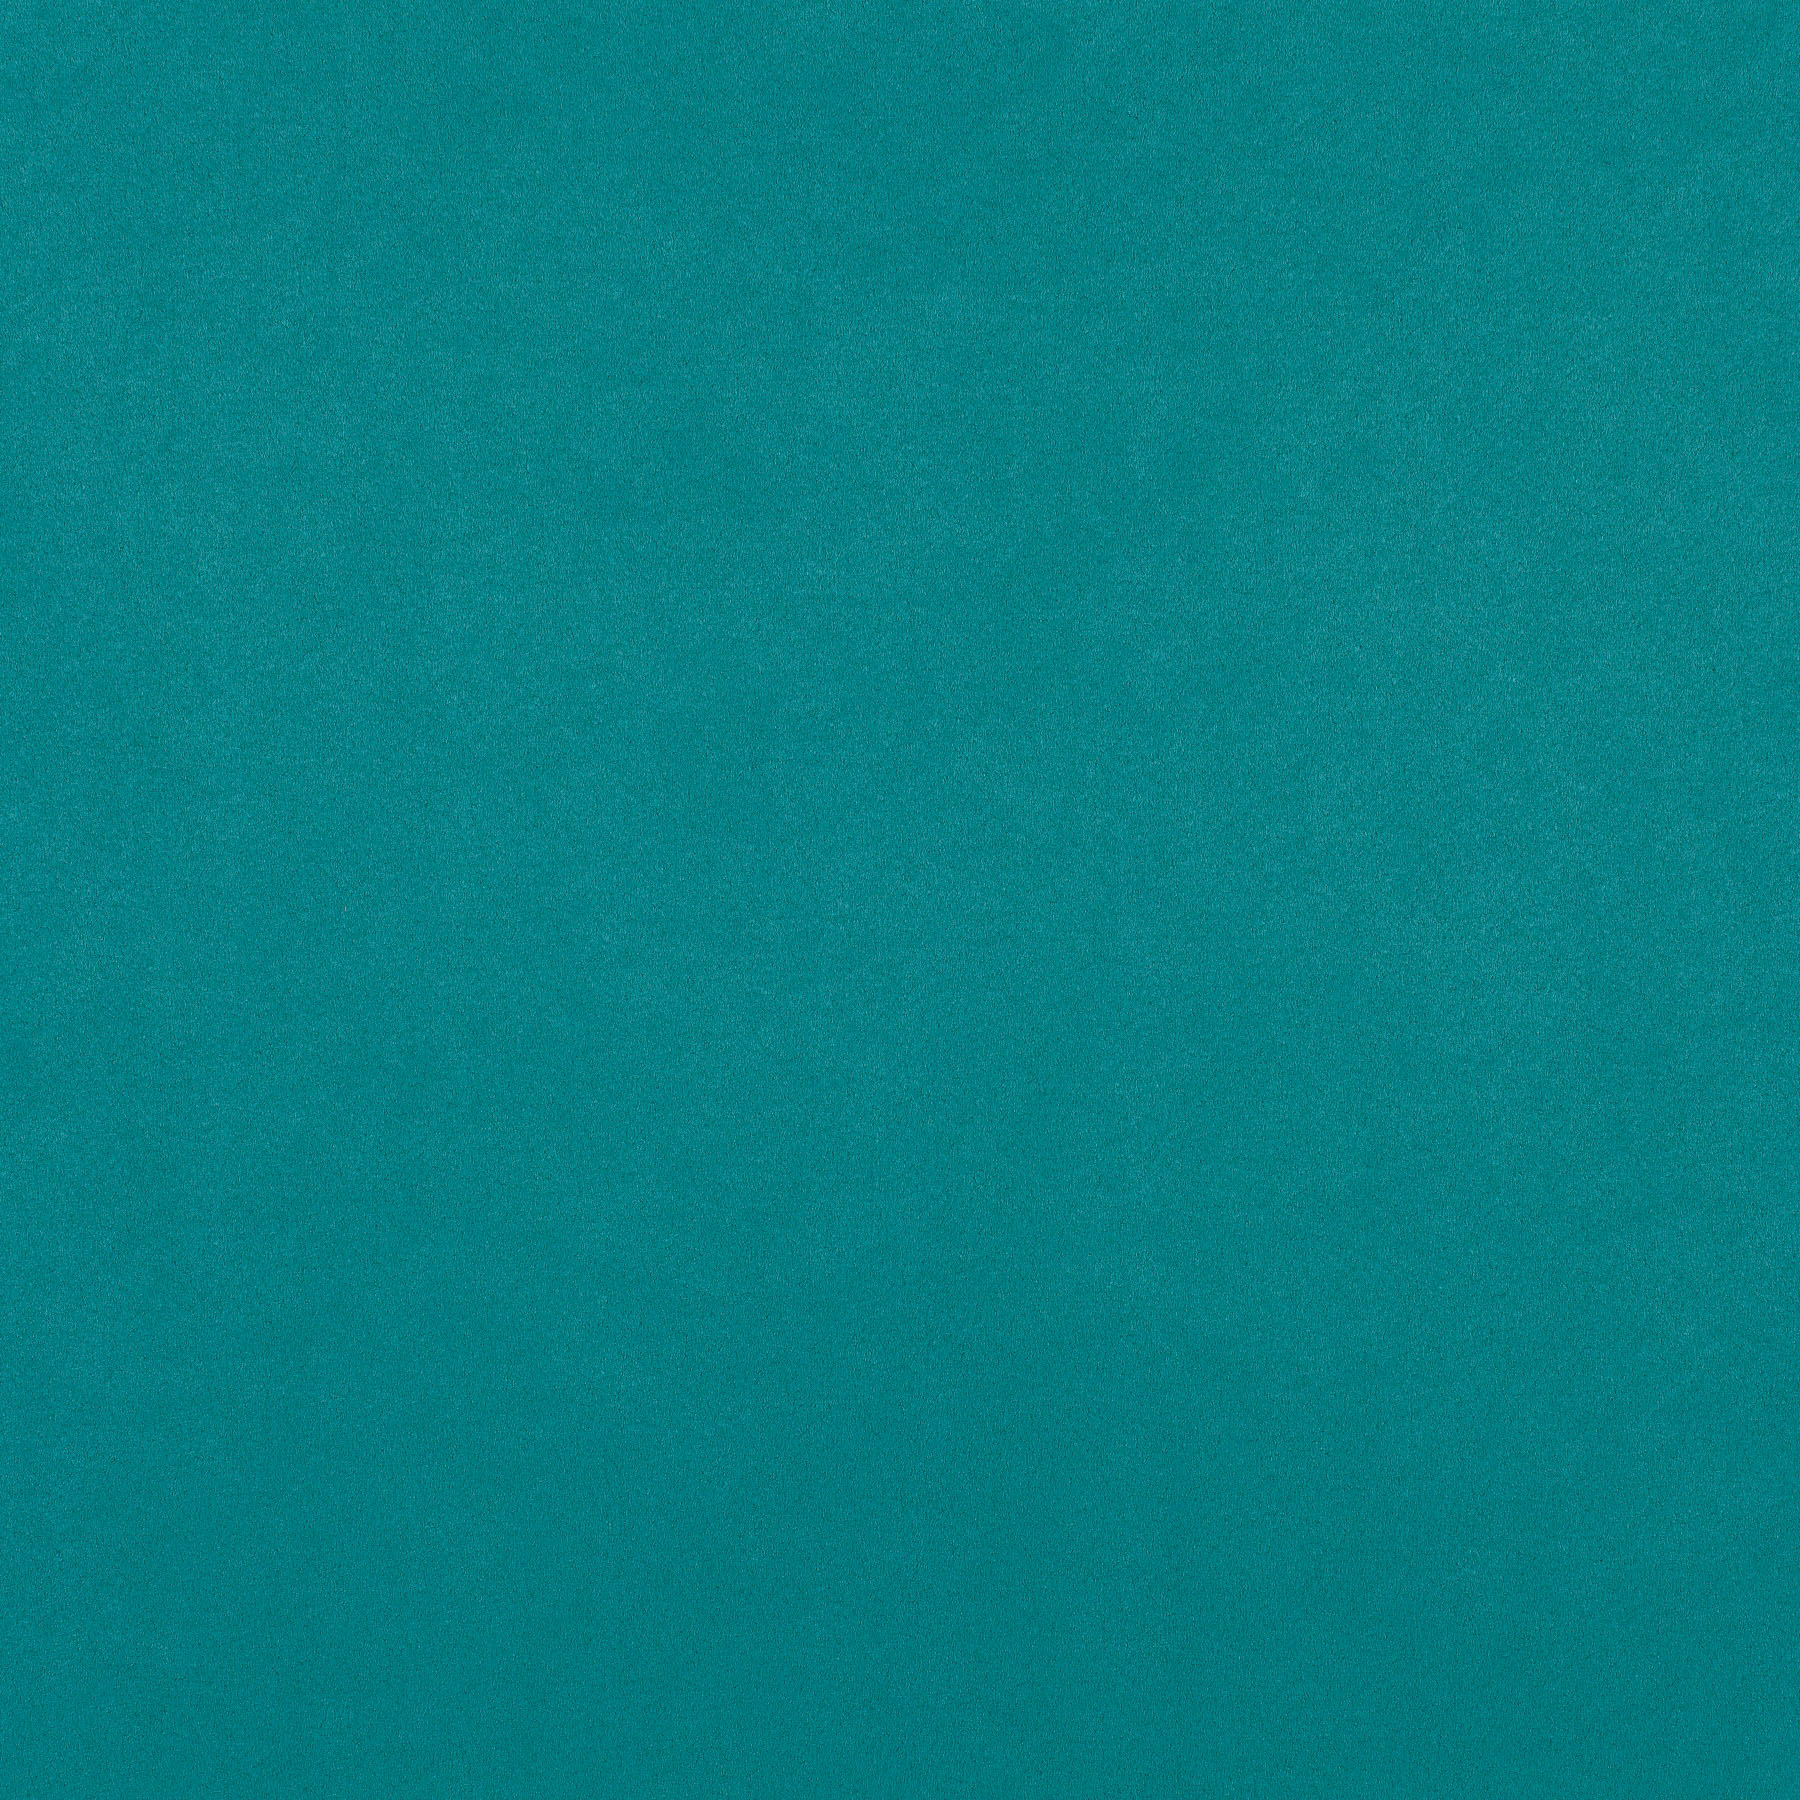 upholstery fabric jabana 1 3002 431 jab anstoetz fabrics. Black Bedroom Furniture Sets. Home Design Ideas